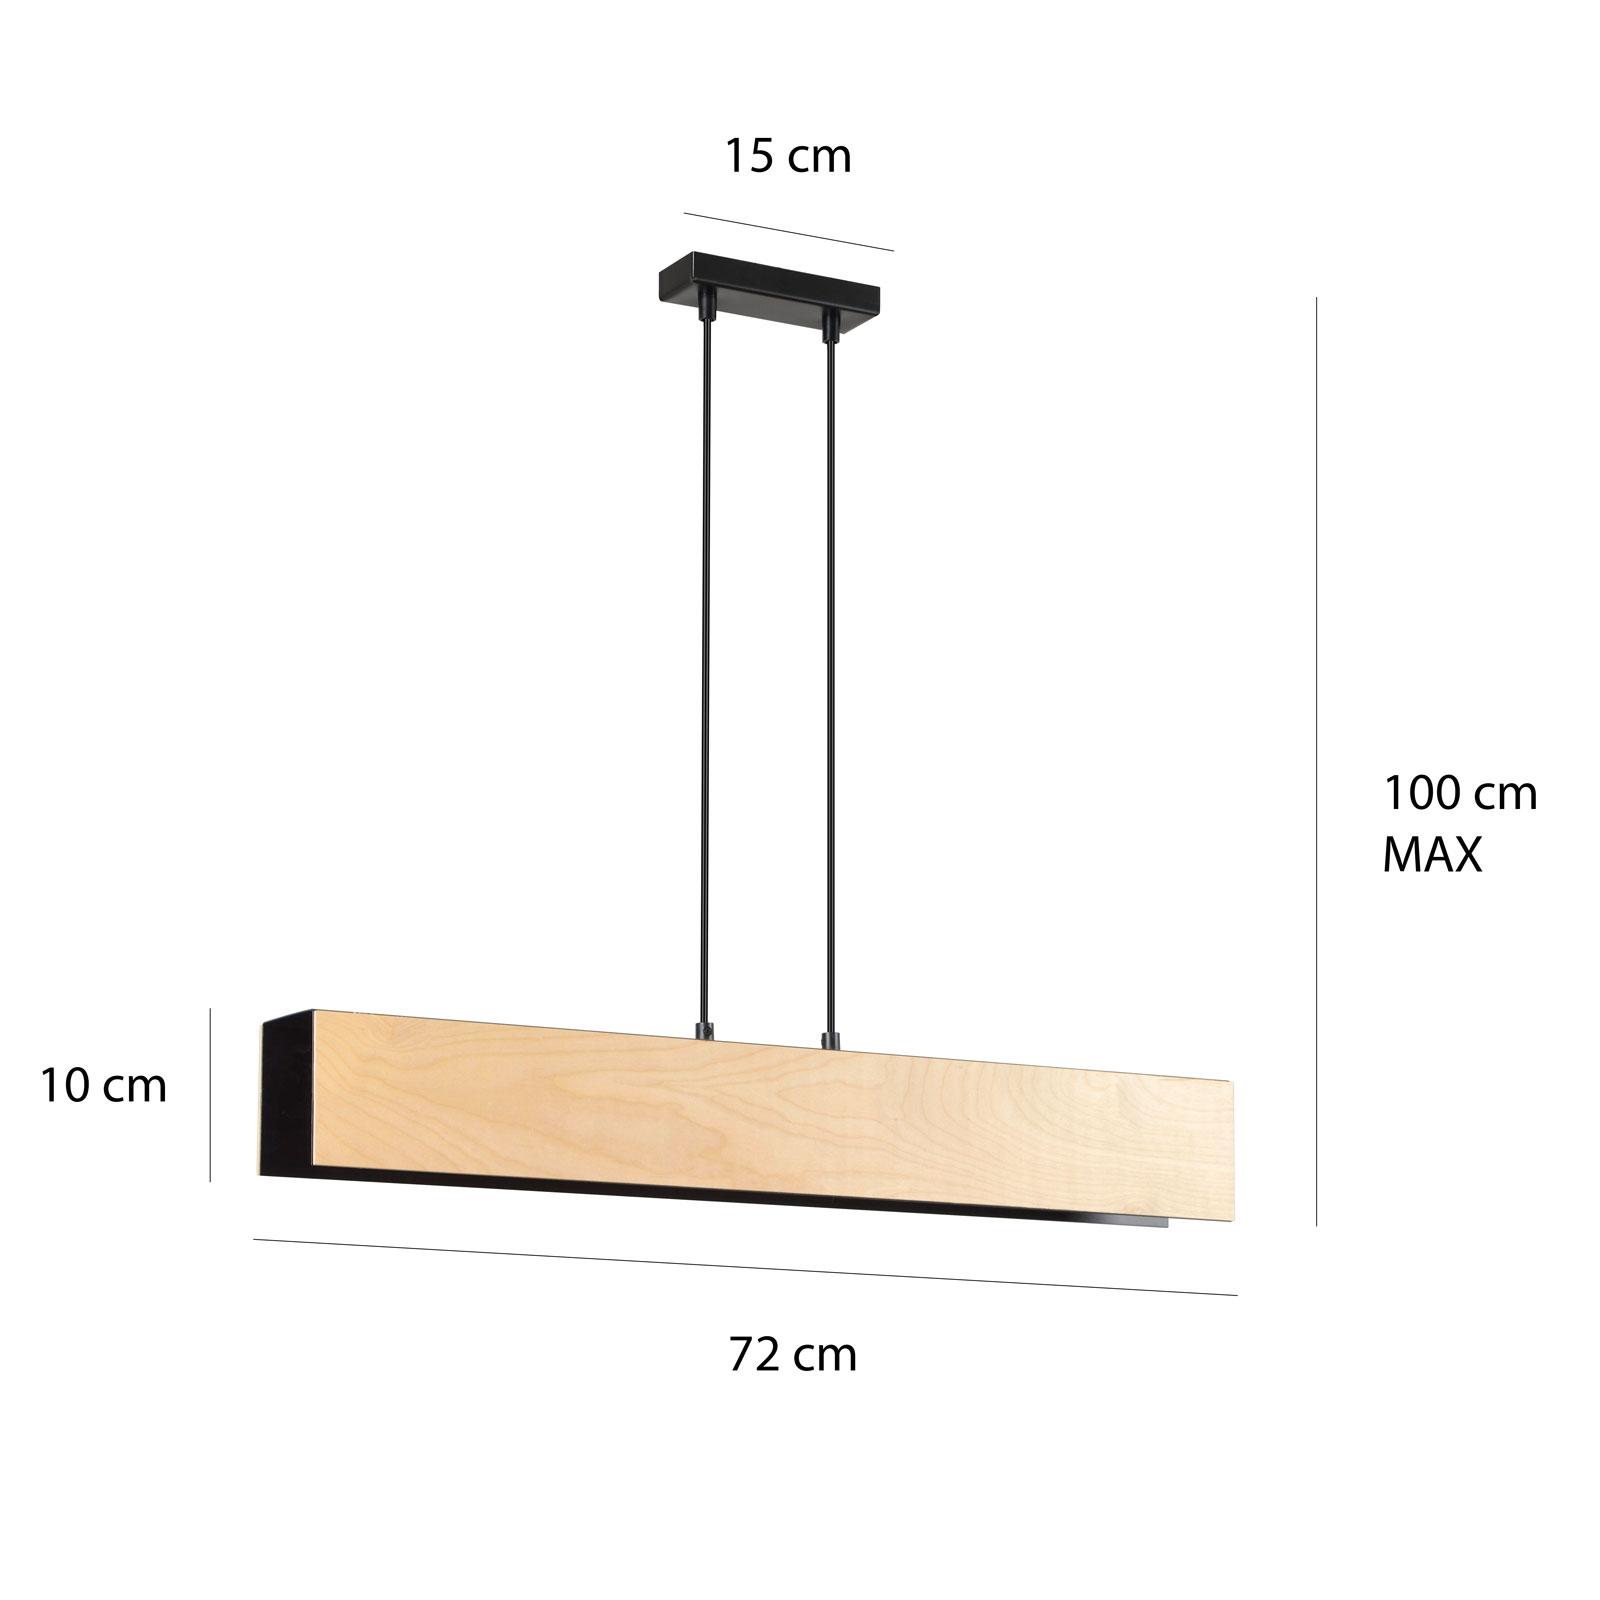 Riippuvalo Carlo 3 Black, puinen varjostin, 72 cm